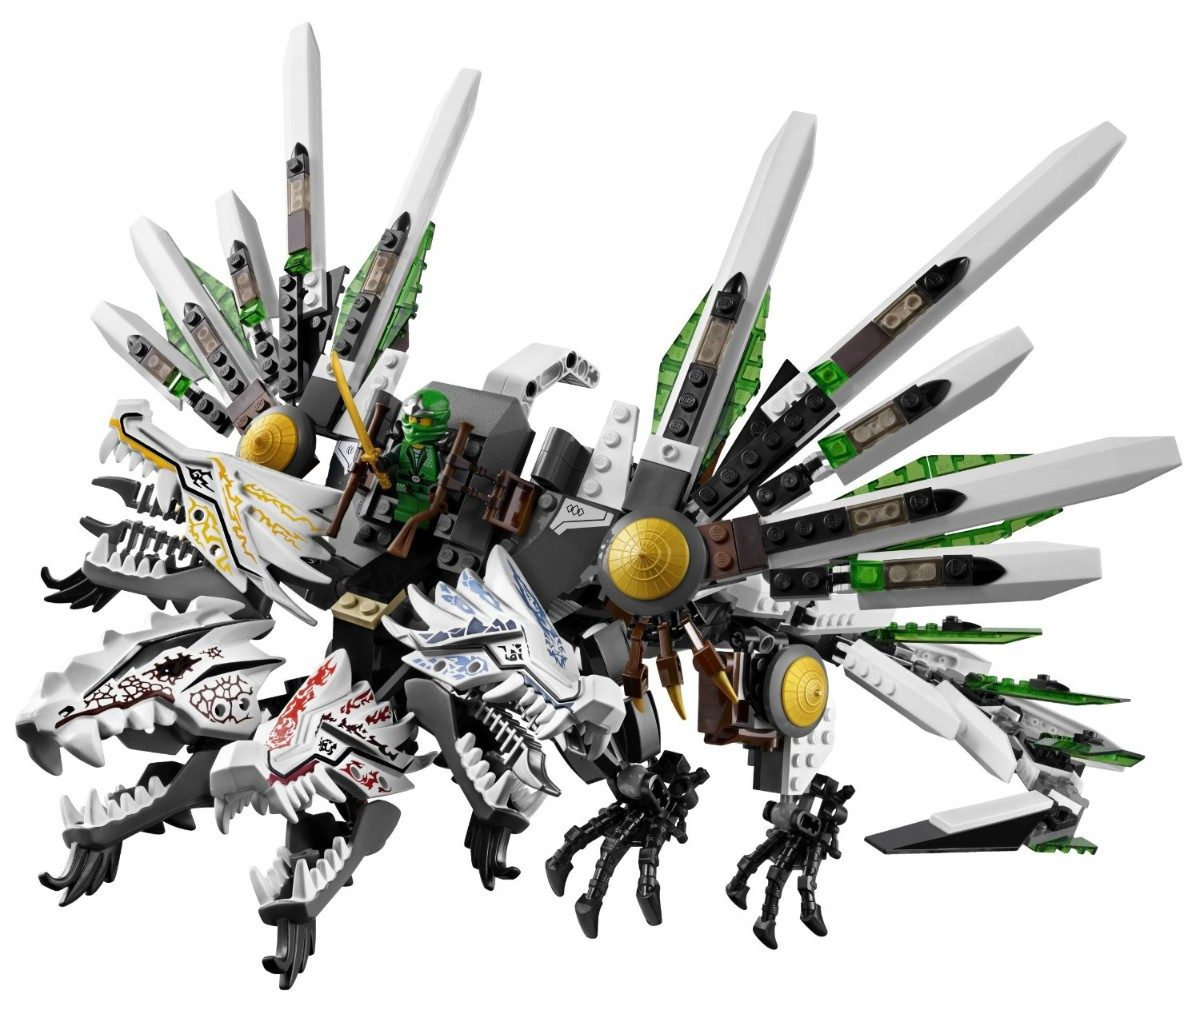 Lego Ninjago 9450 - Epic Dragon Battle - 915 Peças - R ...